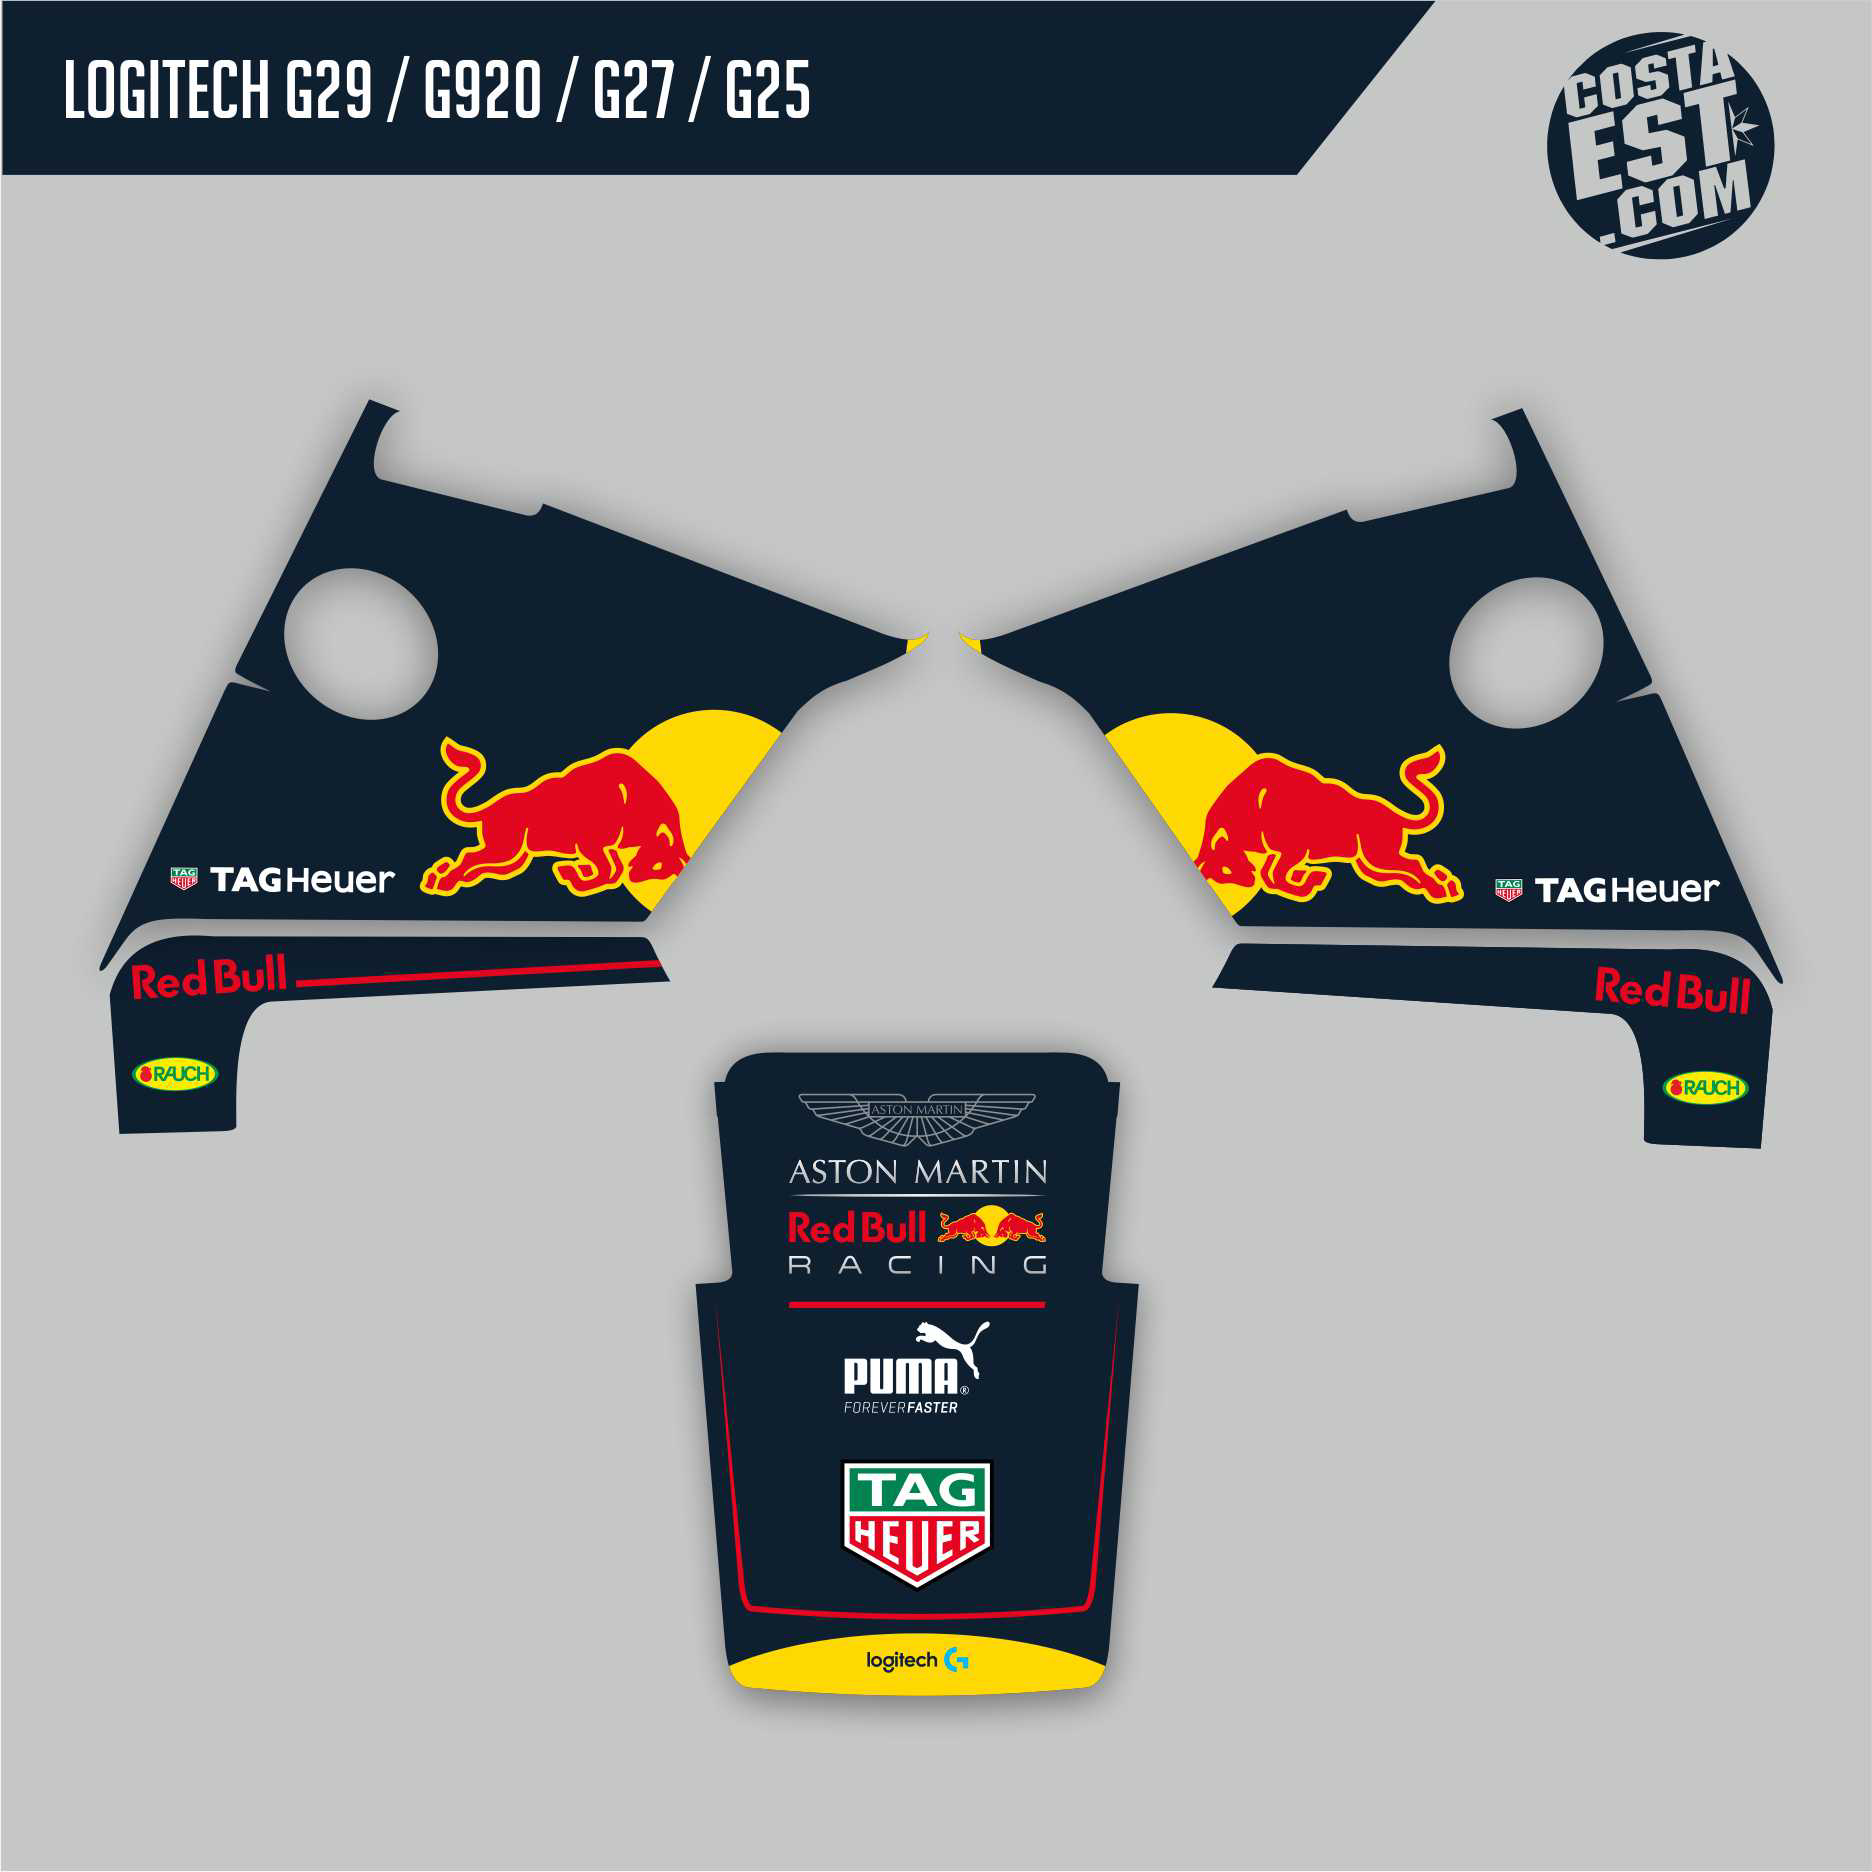 adesivi-volante-logitech-g29-g920-g27-g25